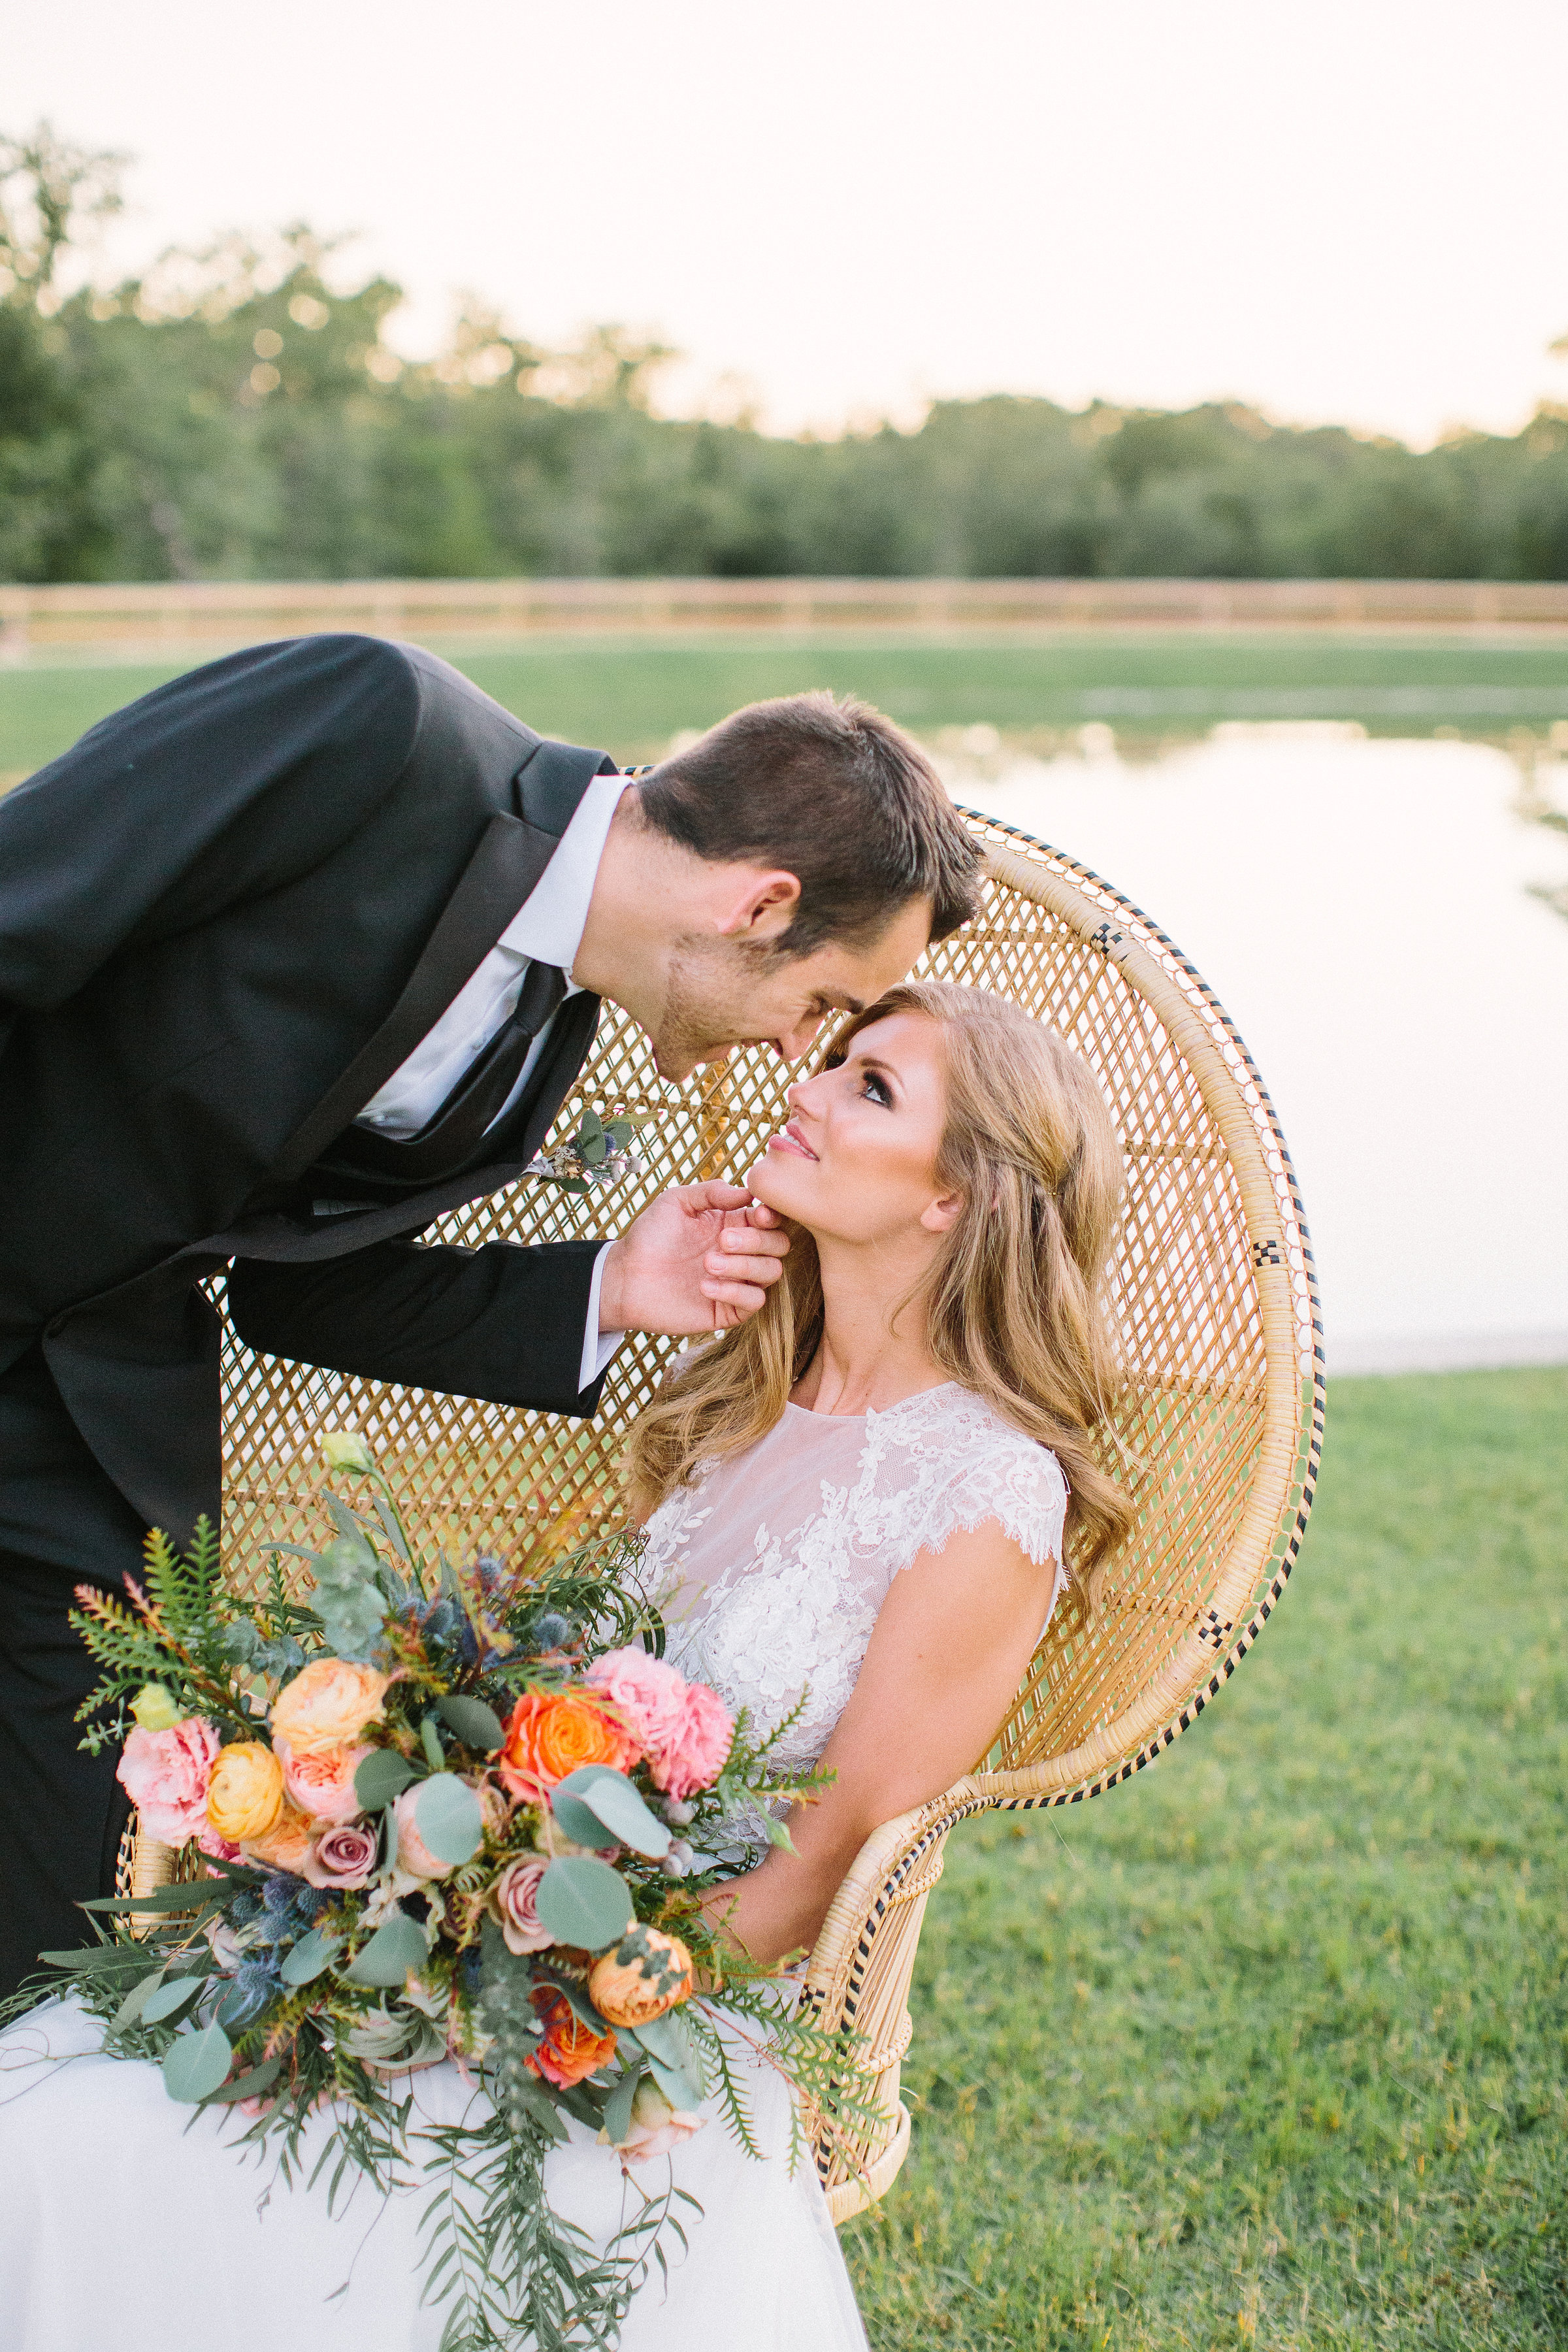 Ellen-Ashton-Photography-Peach-Creek-Ranch-Weddings-Wed-and-Prosper397